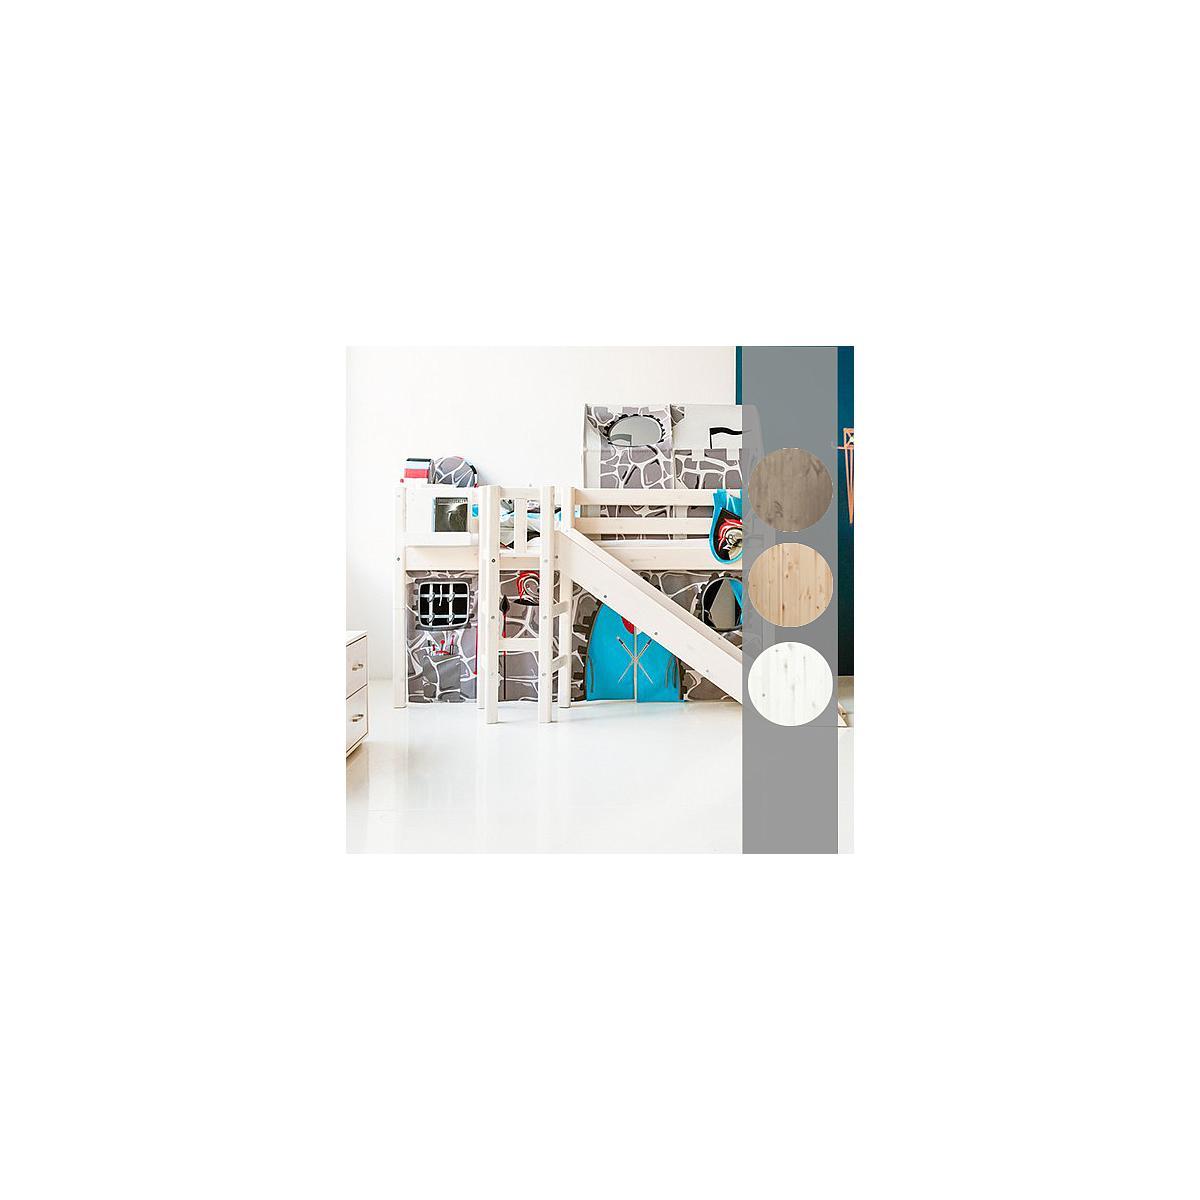 Cama media alta 90x190 CLASSIC Flexa plataforma y tobogán terra